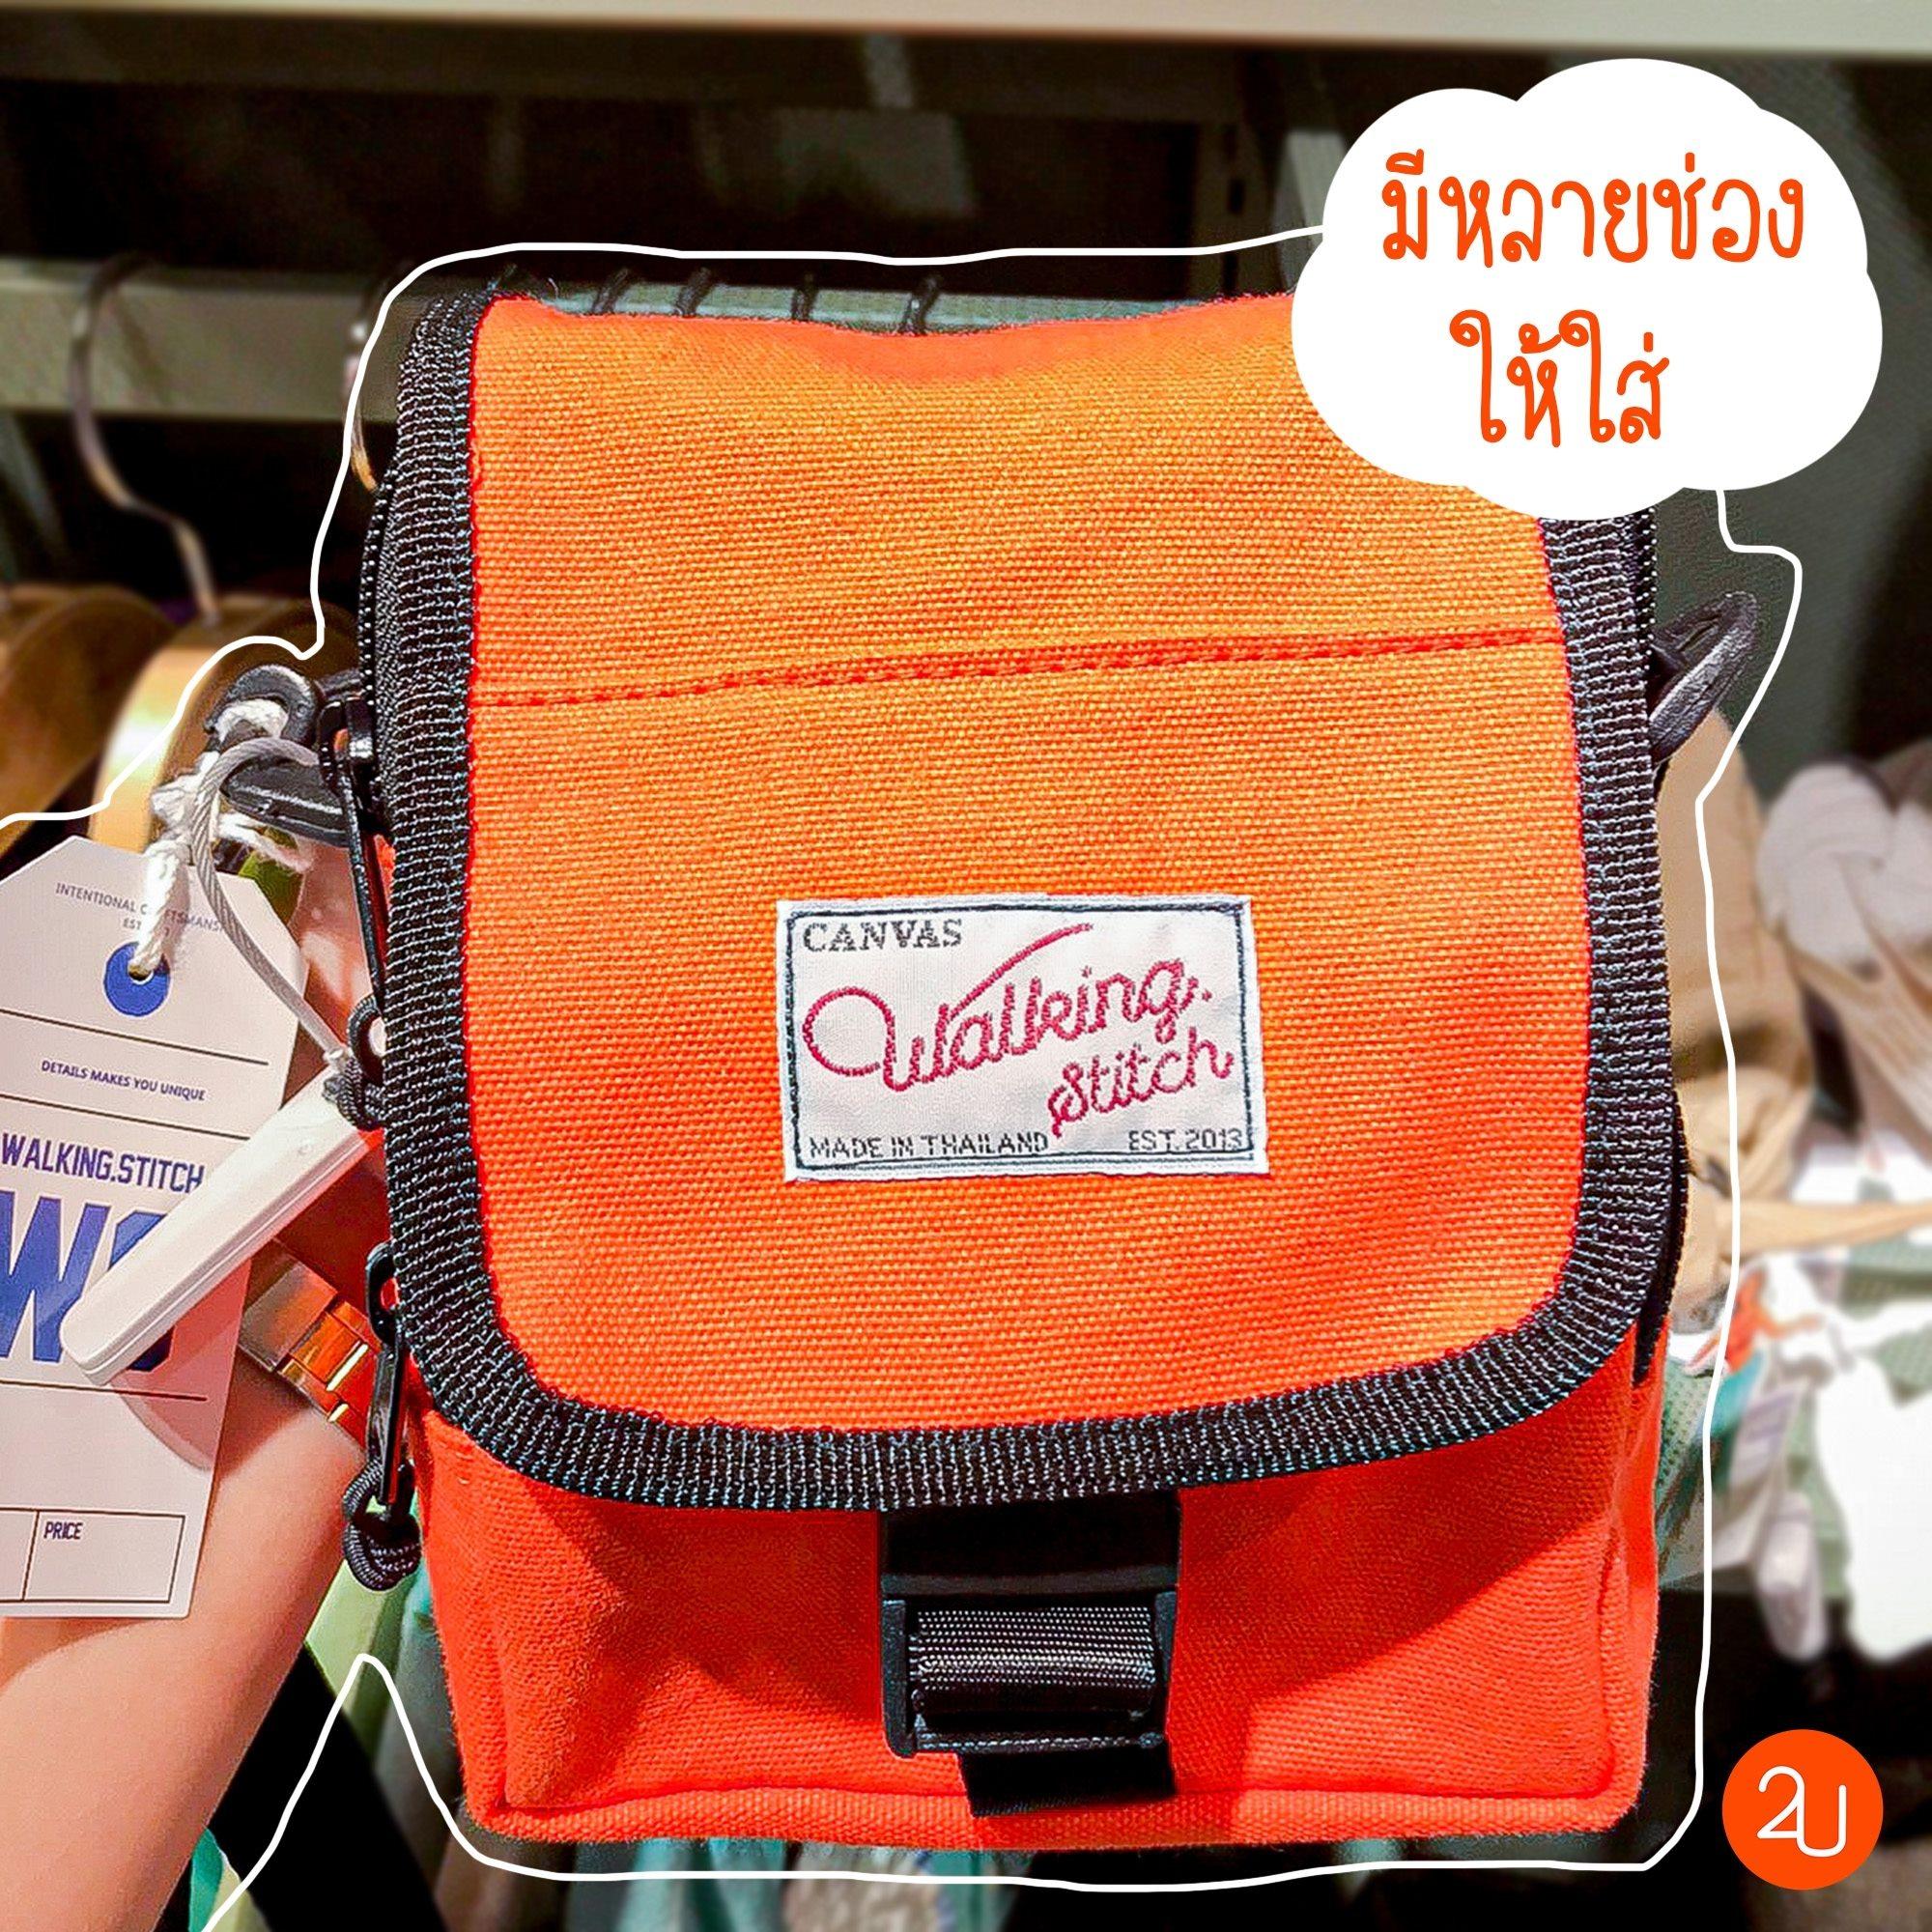 Paul Shoulder bag Bright Orange